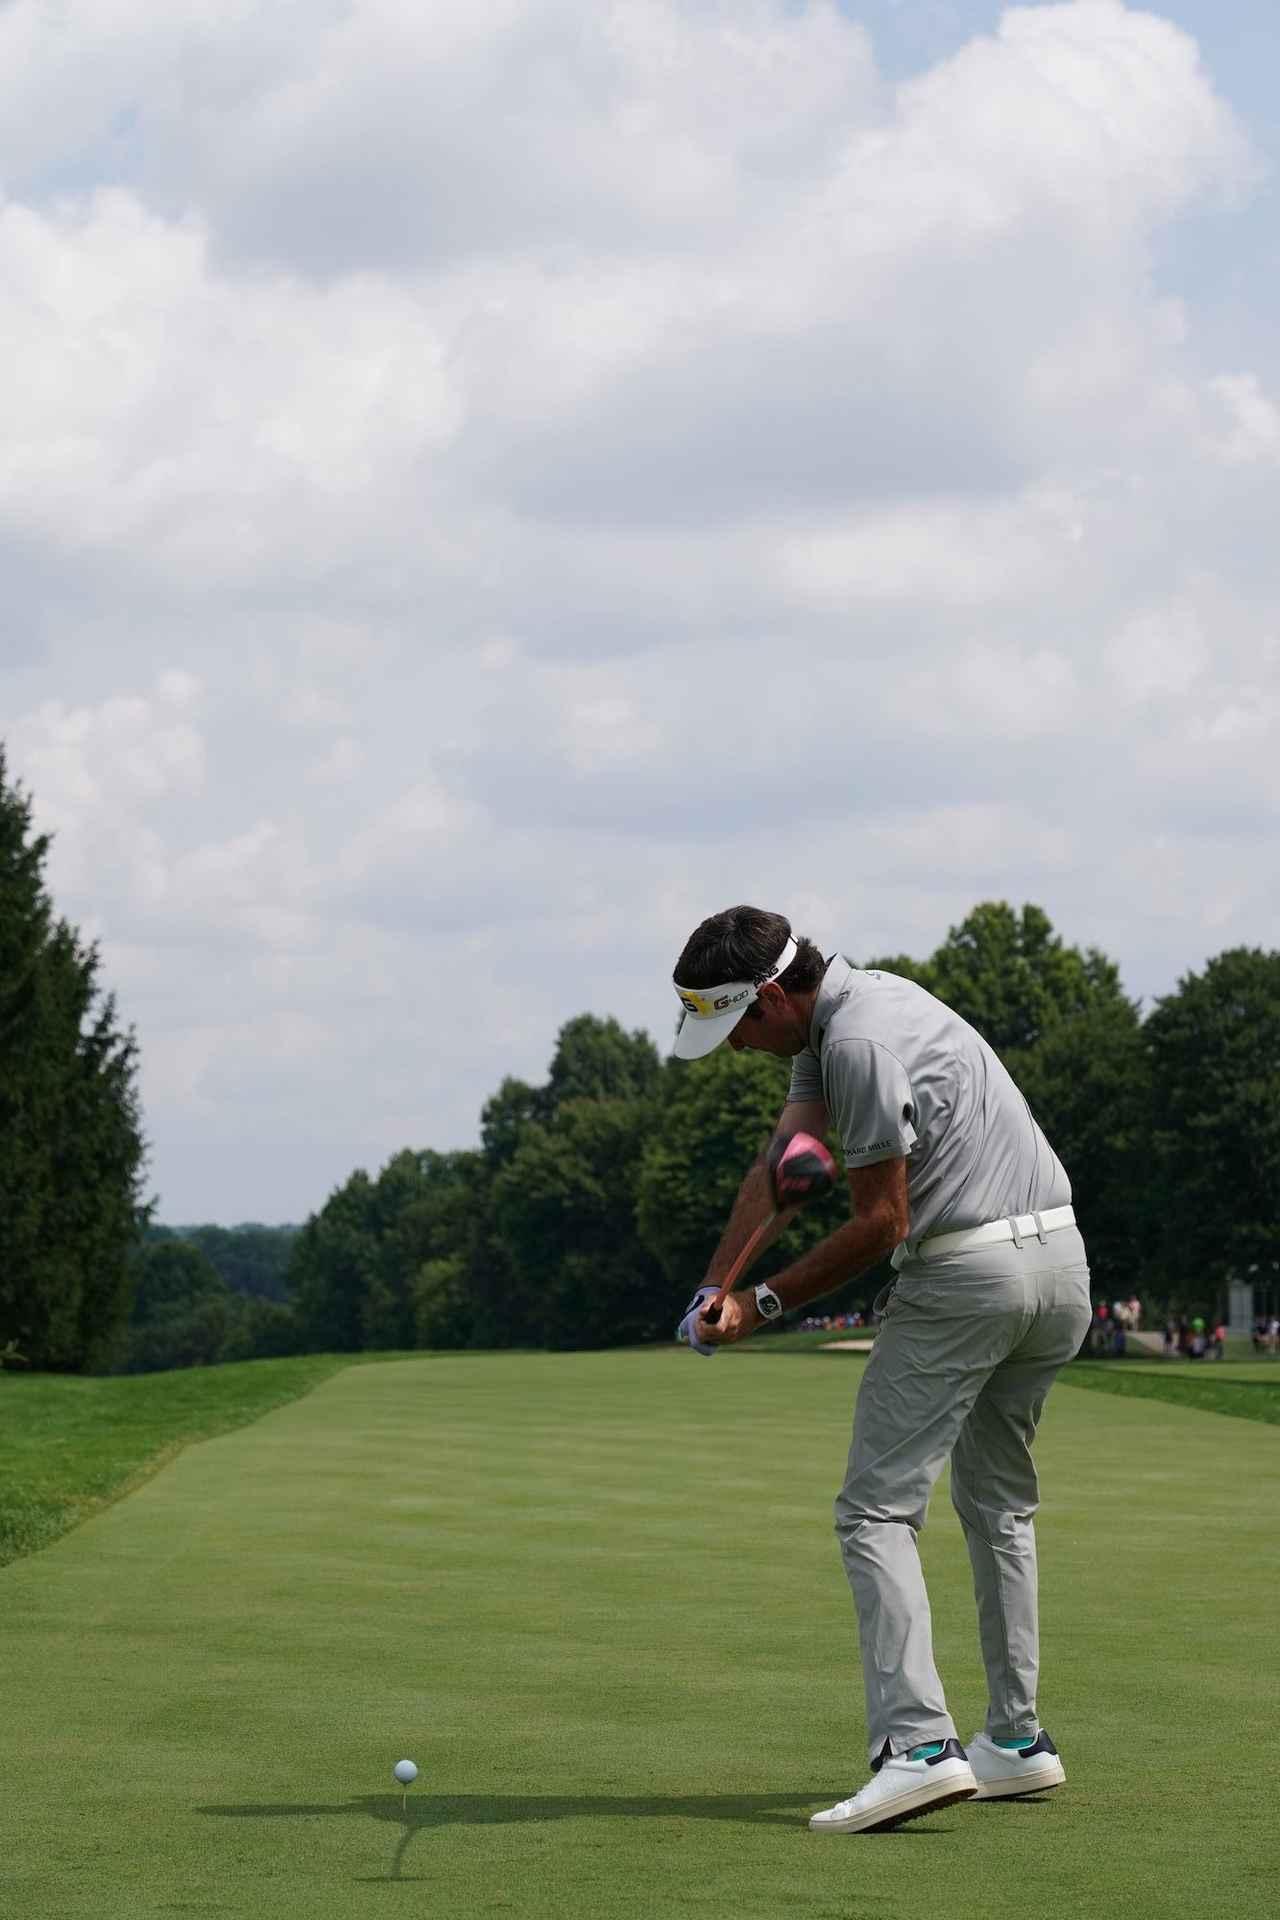 Images : 15番目の画像 - 強烈! バッバ・ワトソンのドライバーショット - みんなのゴルフダイジェスト